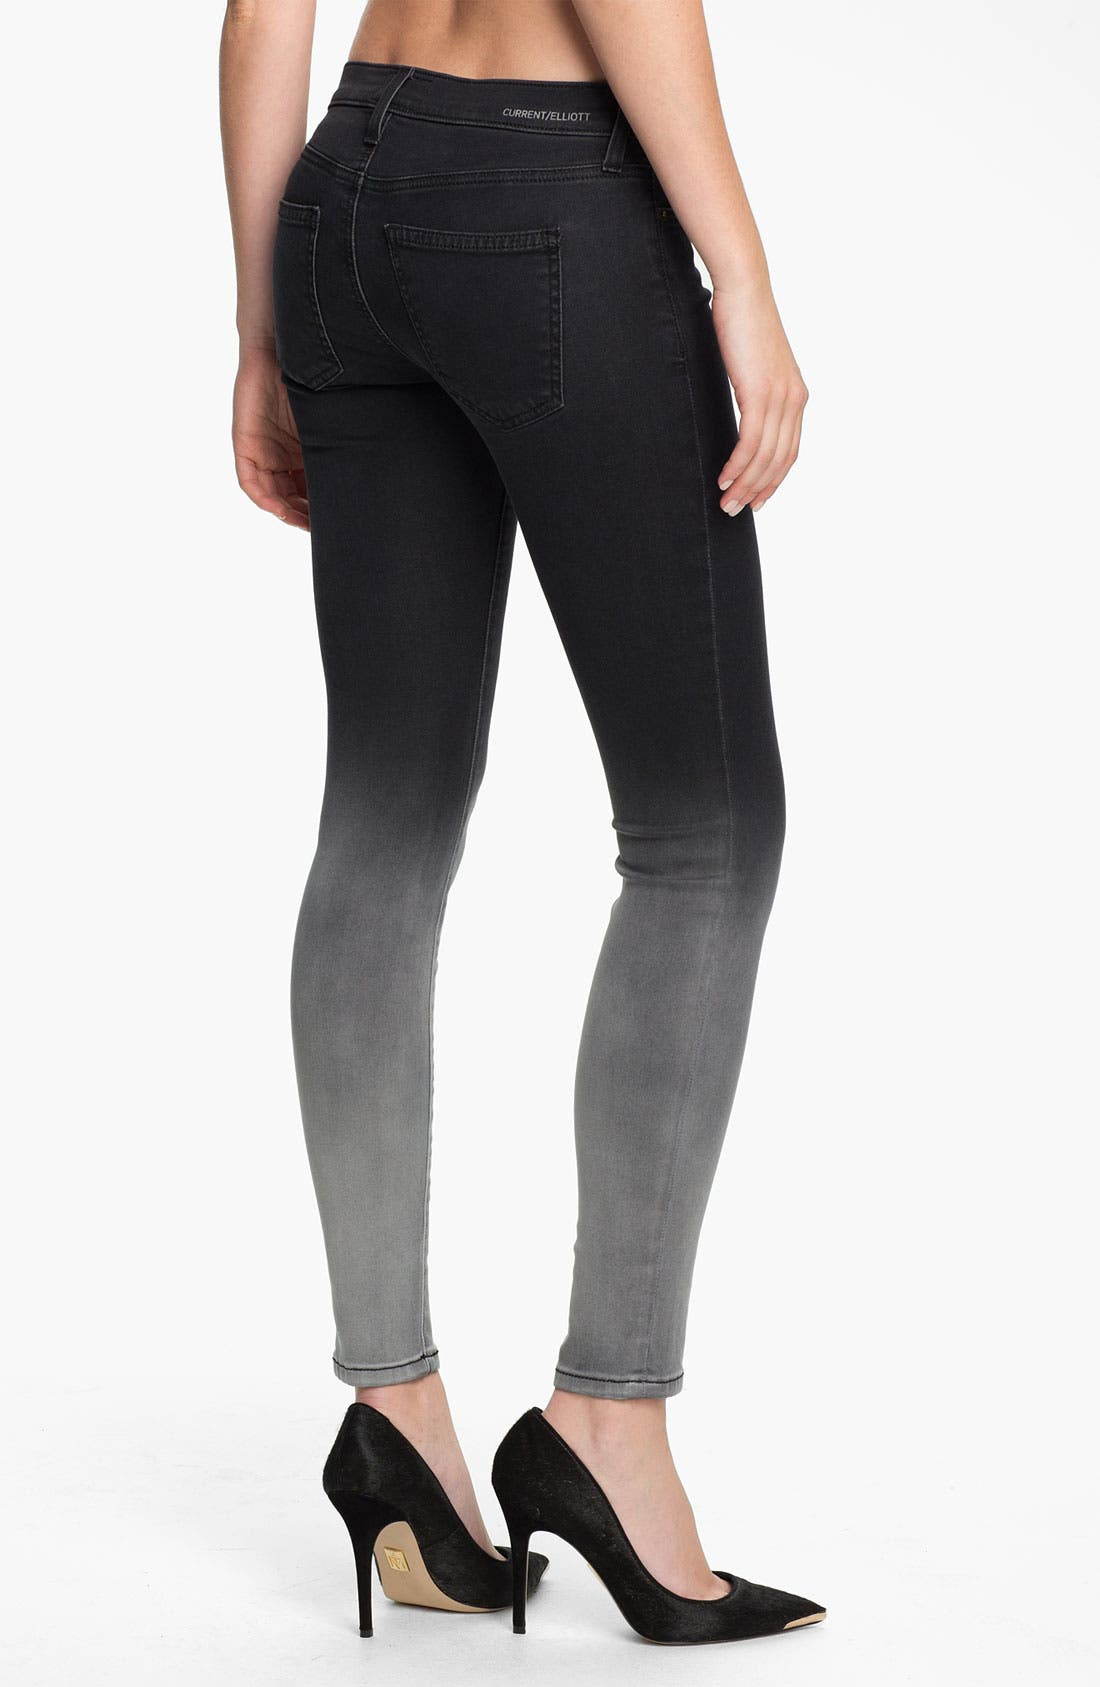 Alternate Image 2  - Current/Elliott 'The Ankle' Print Crop Skinny Jeans (Black Fade)